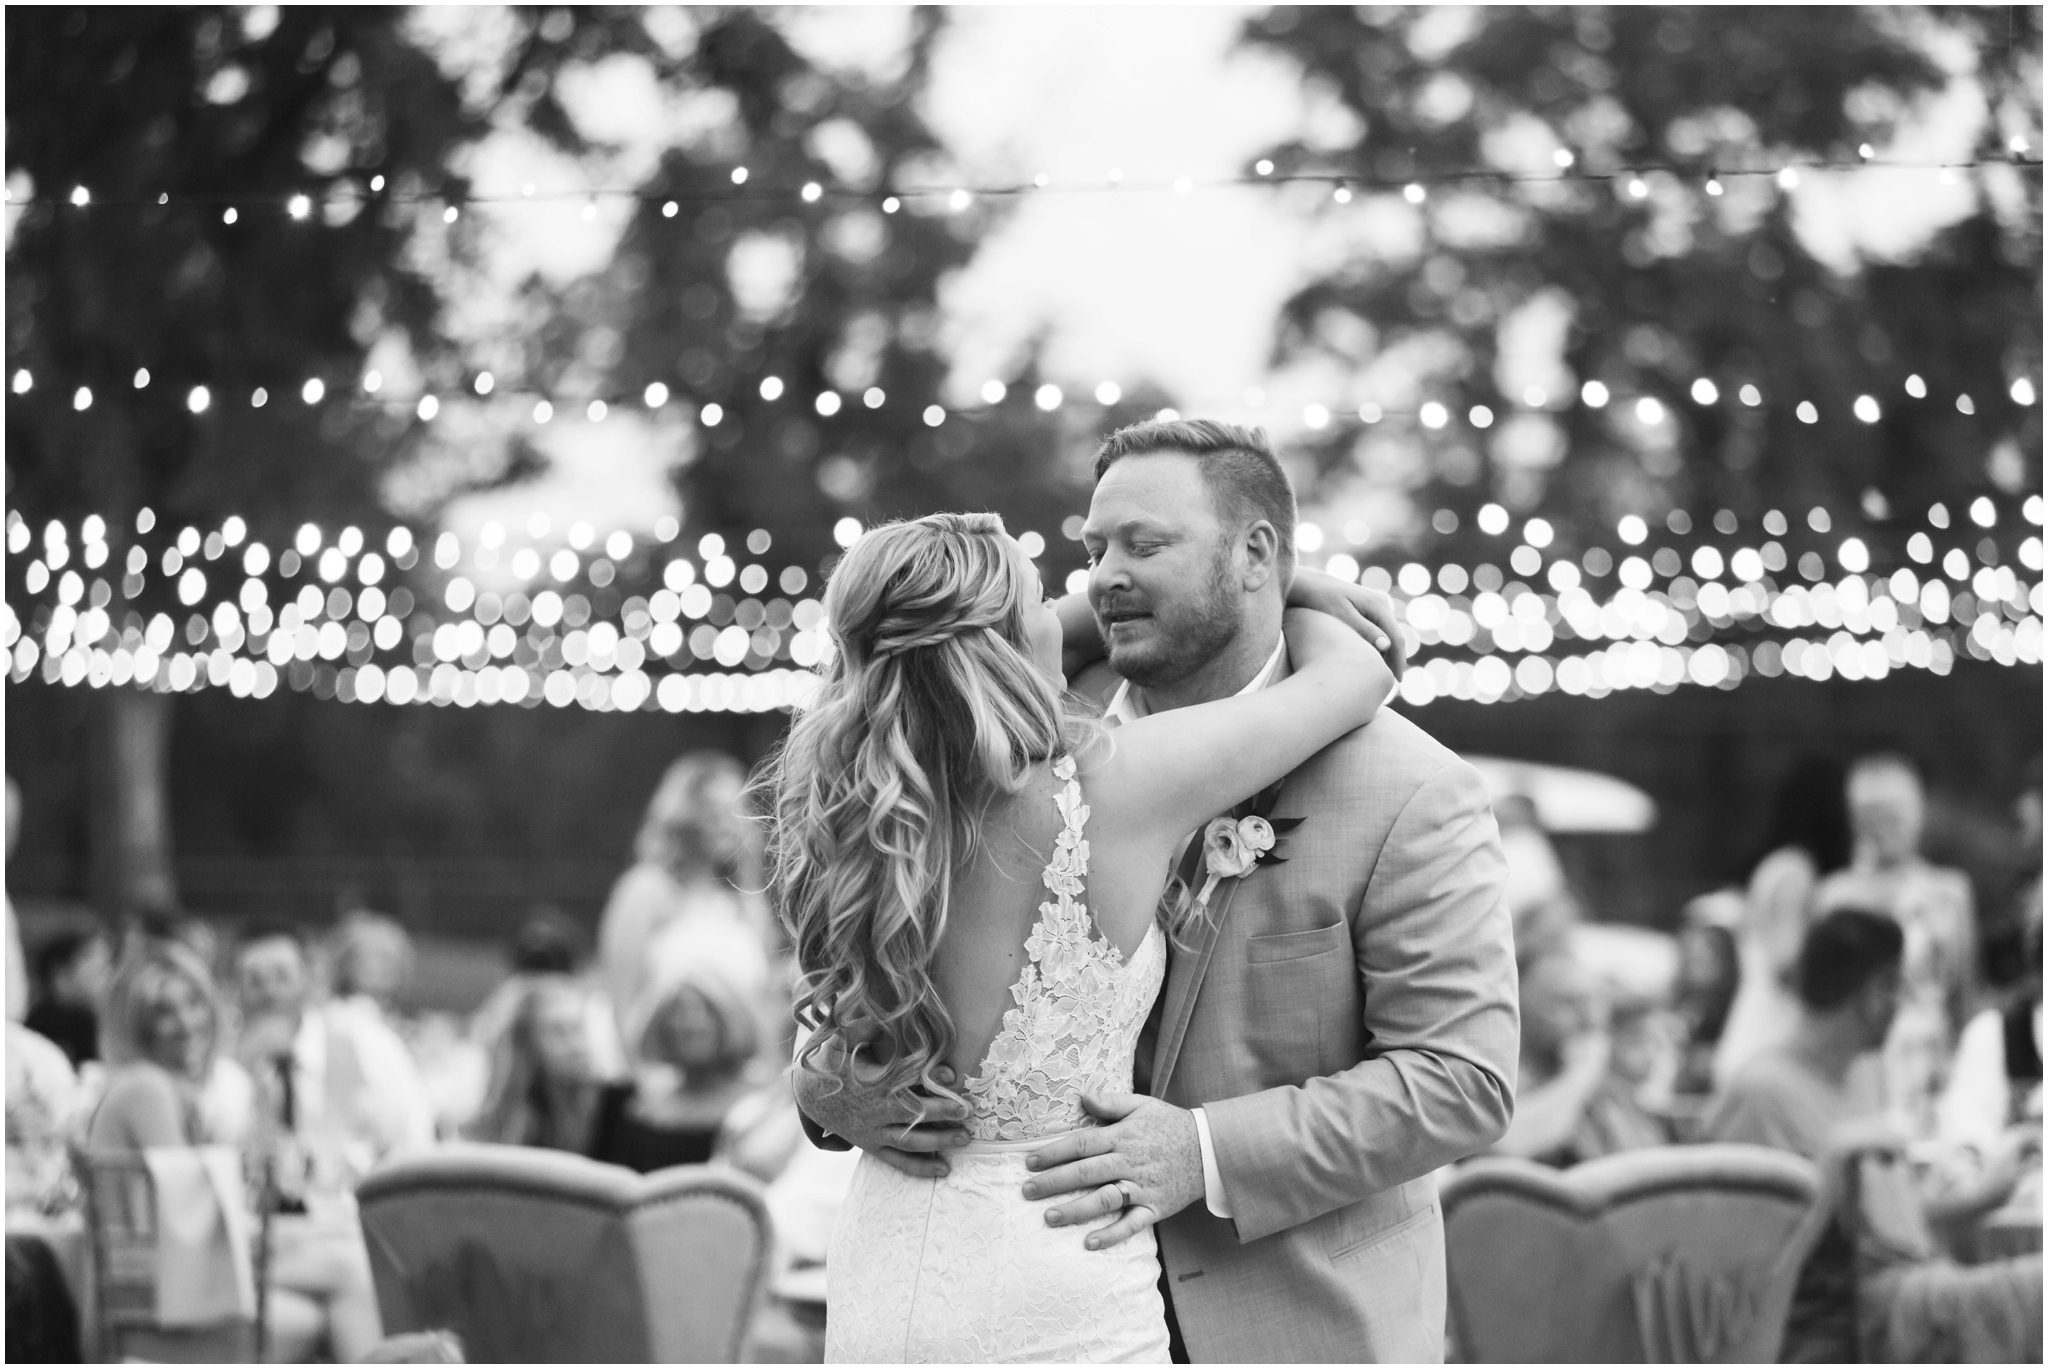 cindy_joseph_wedding_redding_blog_0040.jpg